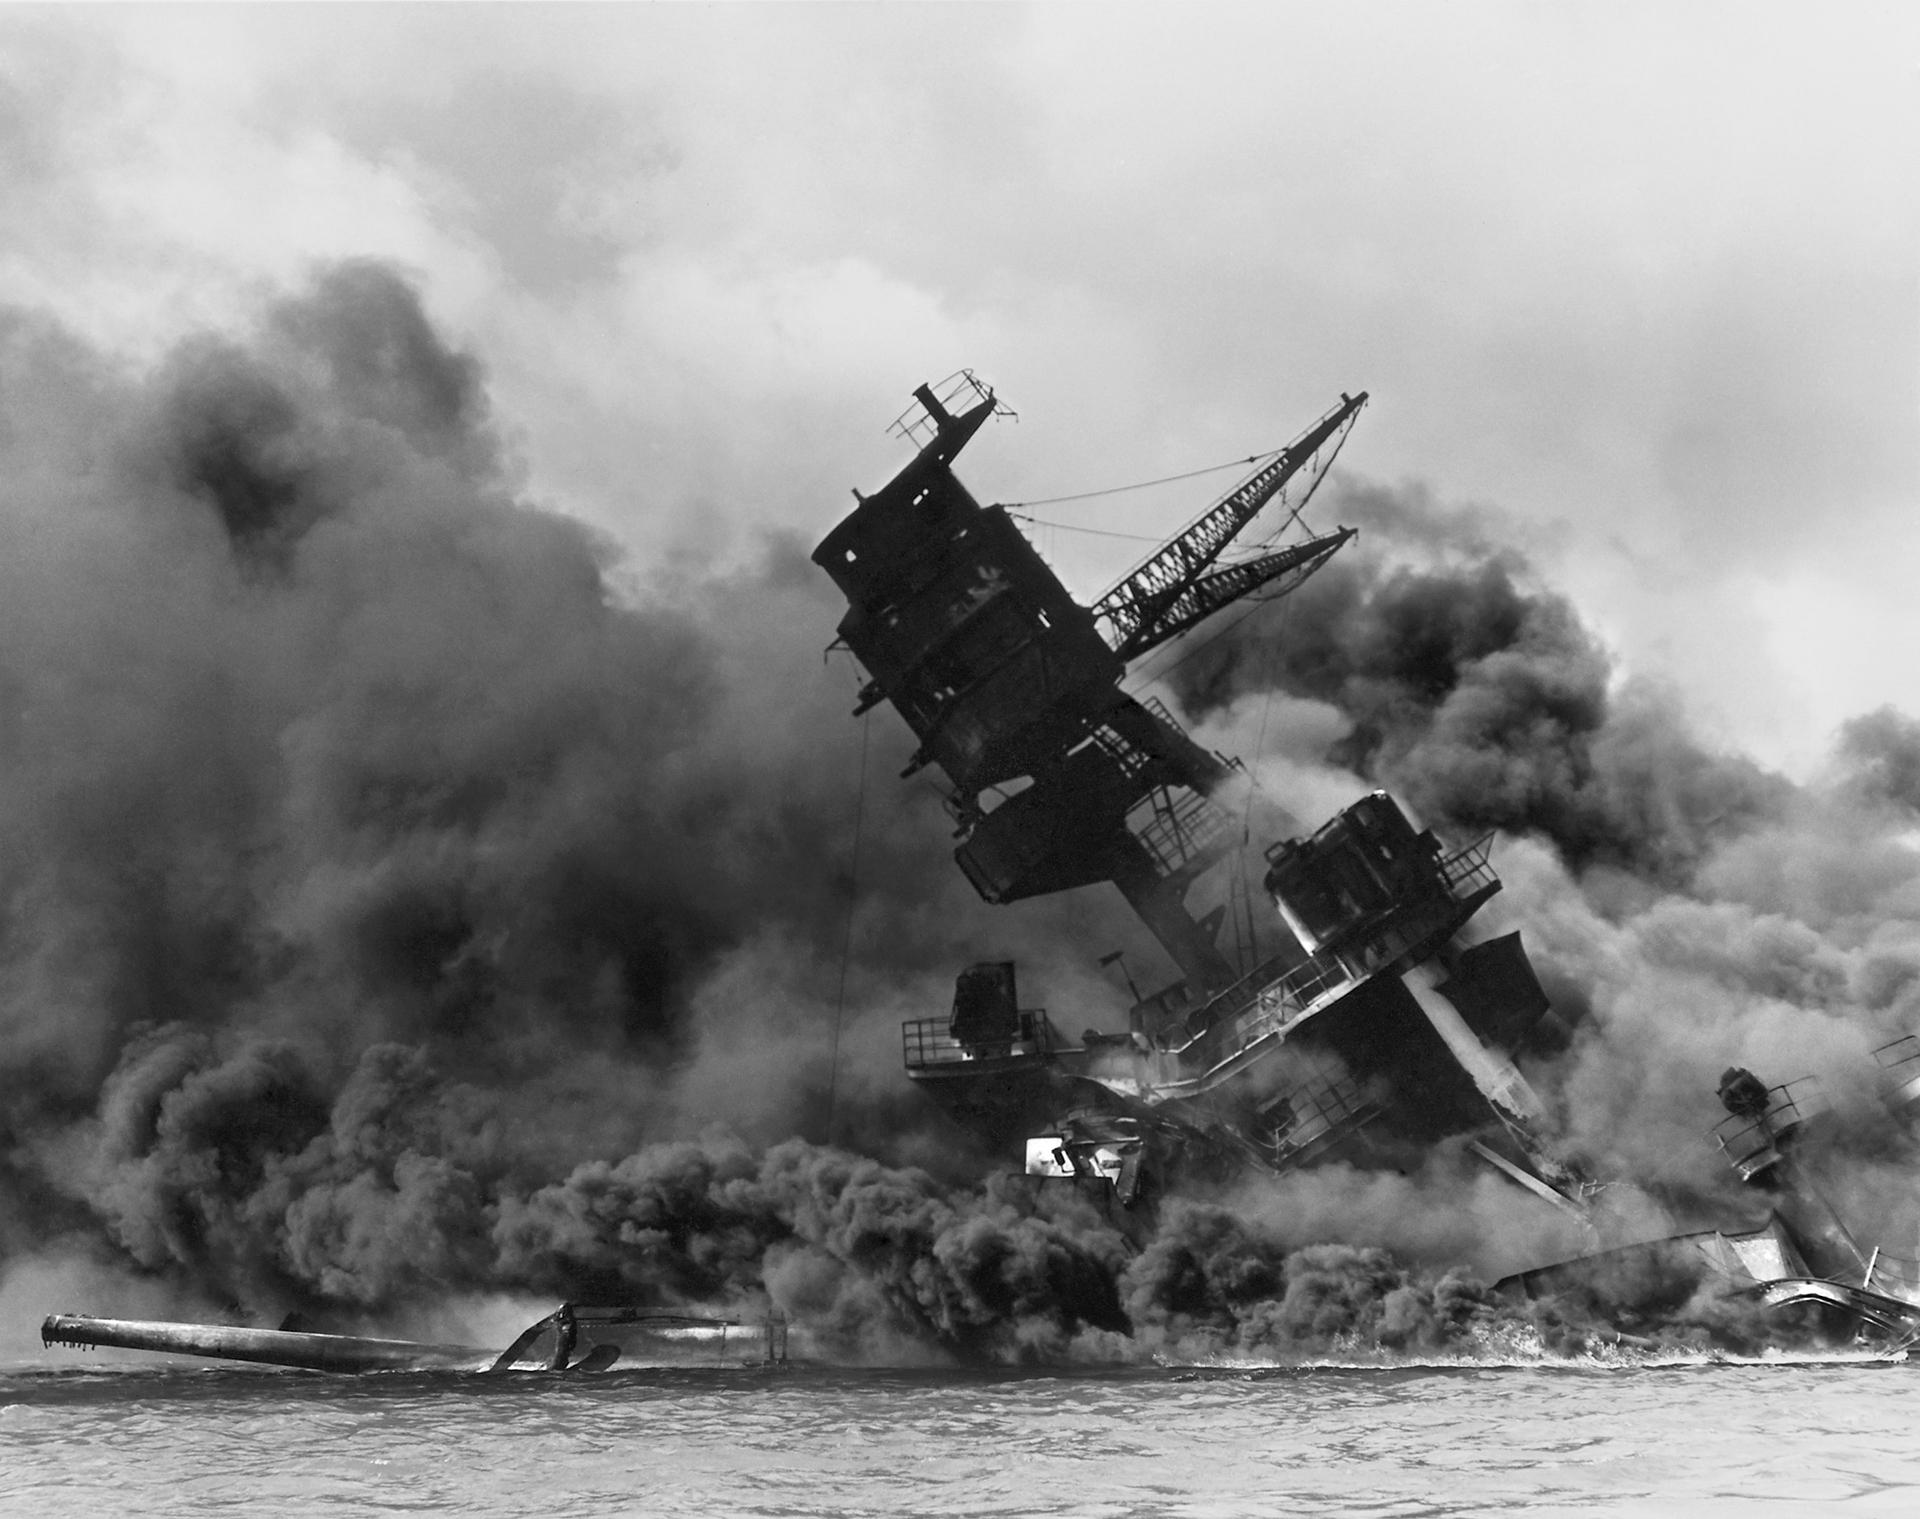 La estructura superior del acorazado hundido USS Arizona se quema tras el ataque aéreo japonés